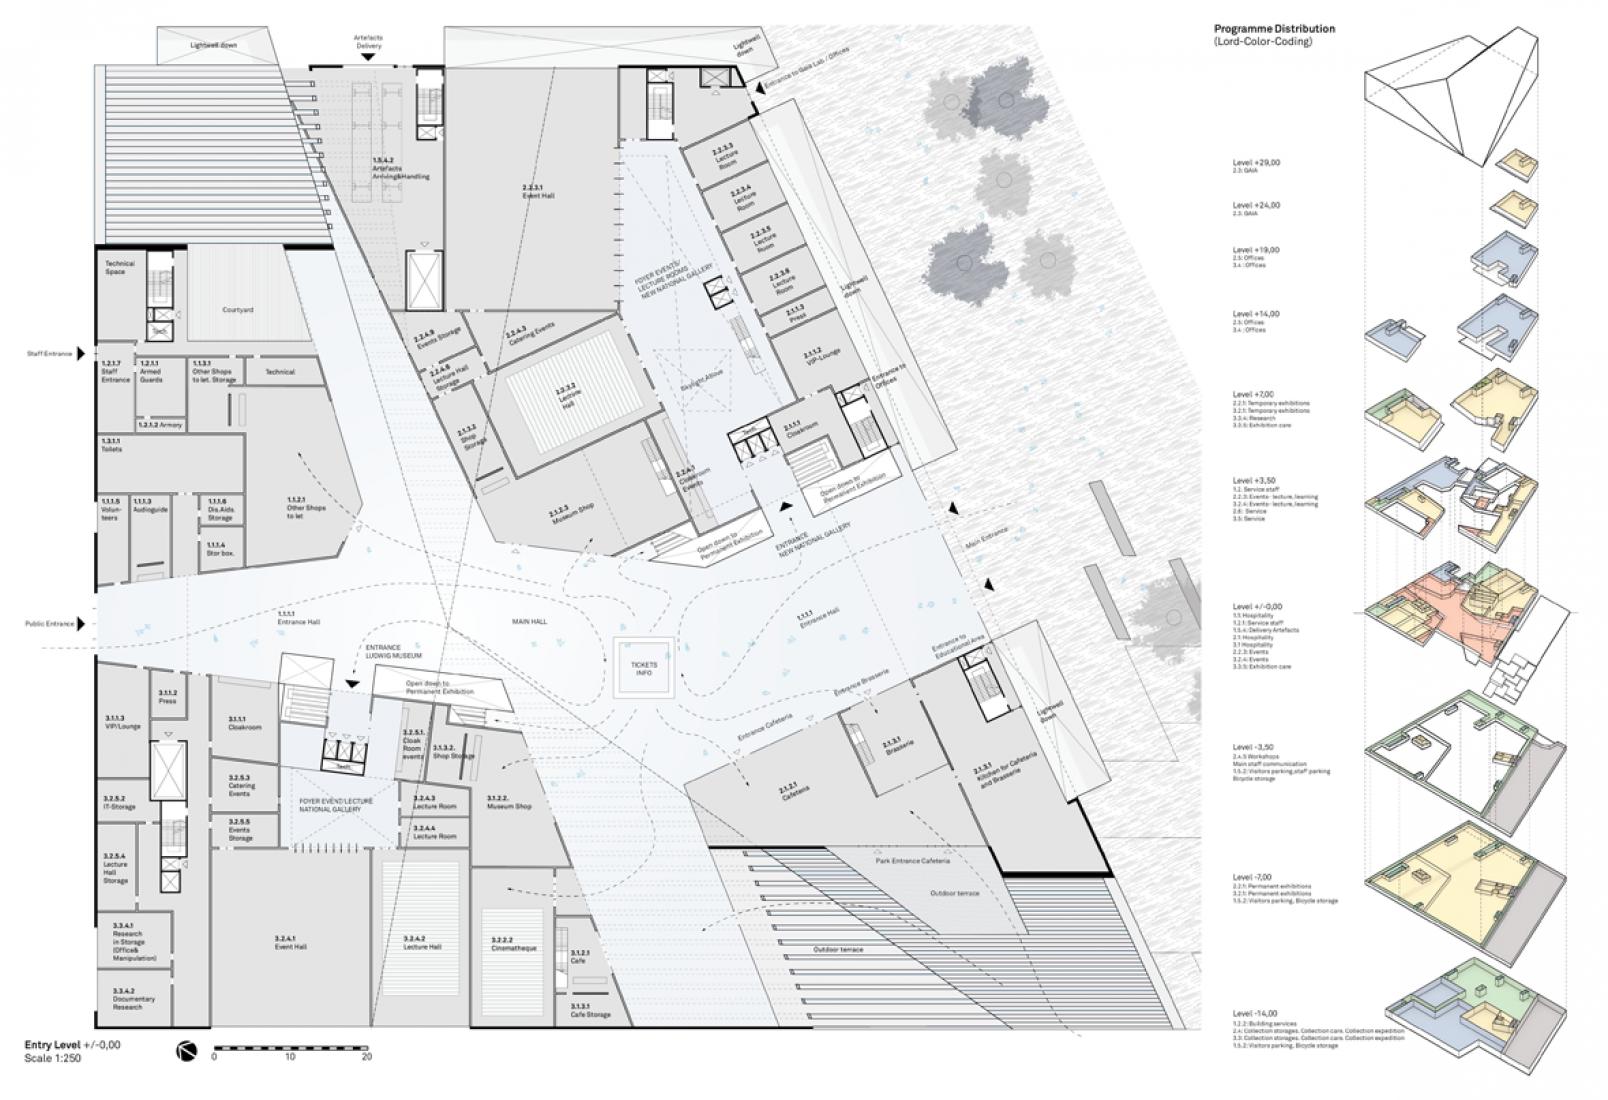 Propuesta De Snohetta Nueva Galeria Nacional Museo Ludwig Ii Ii Sobre Arquitectura Y Mas Desde 1998 Museum Plan Landscape And Urbanism Architecture Budapest